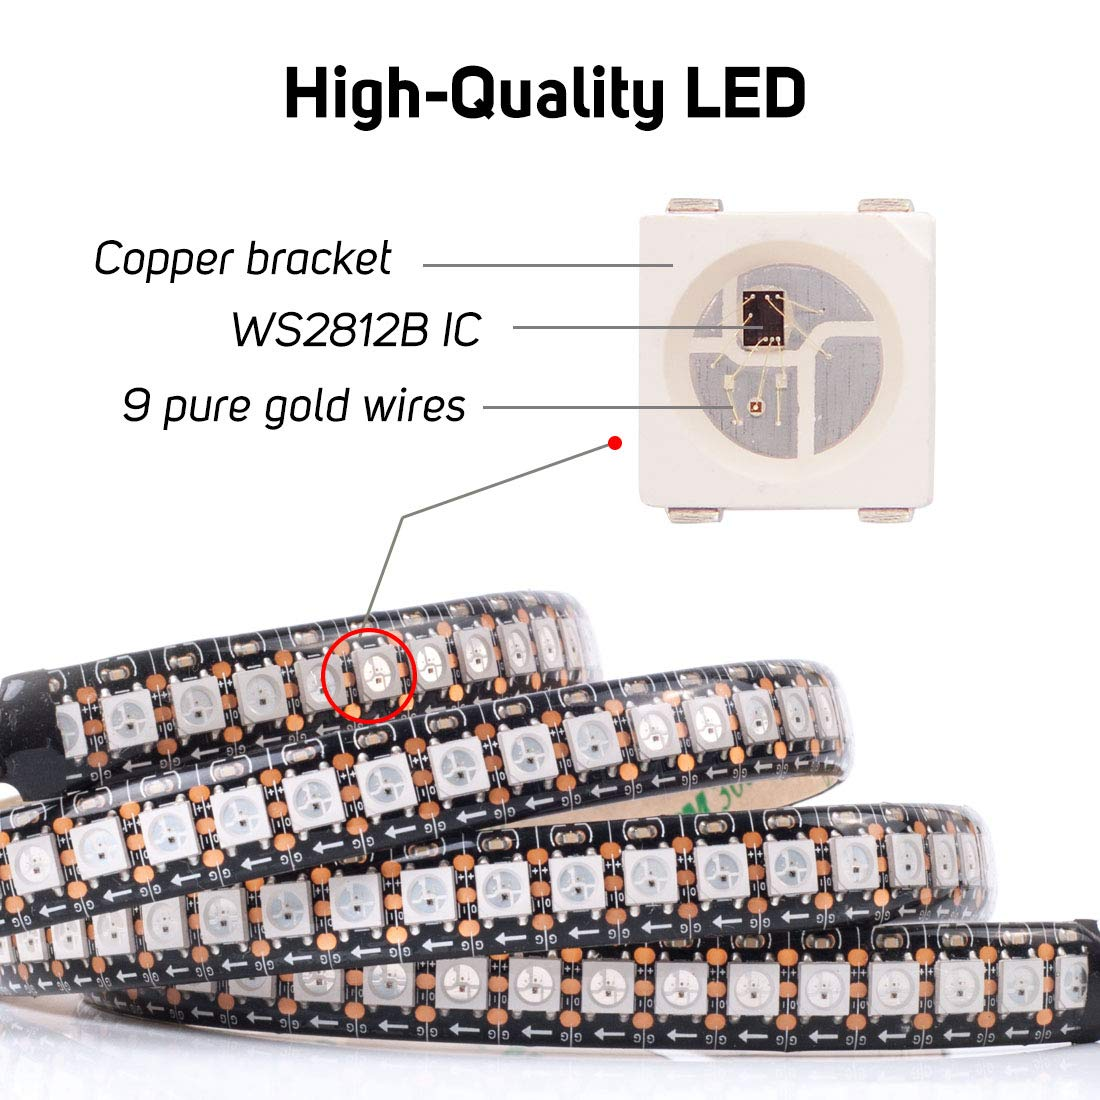 BTF-LIGHTING Strip Led WS2812b Indirizzabile Individualmente 5m 150Leds 30Leds//m Retro Flessibile PCB Nero Colore Dream IP30 Impermeabile DC5V